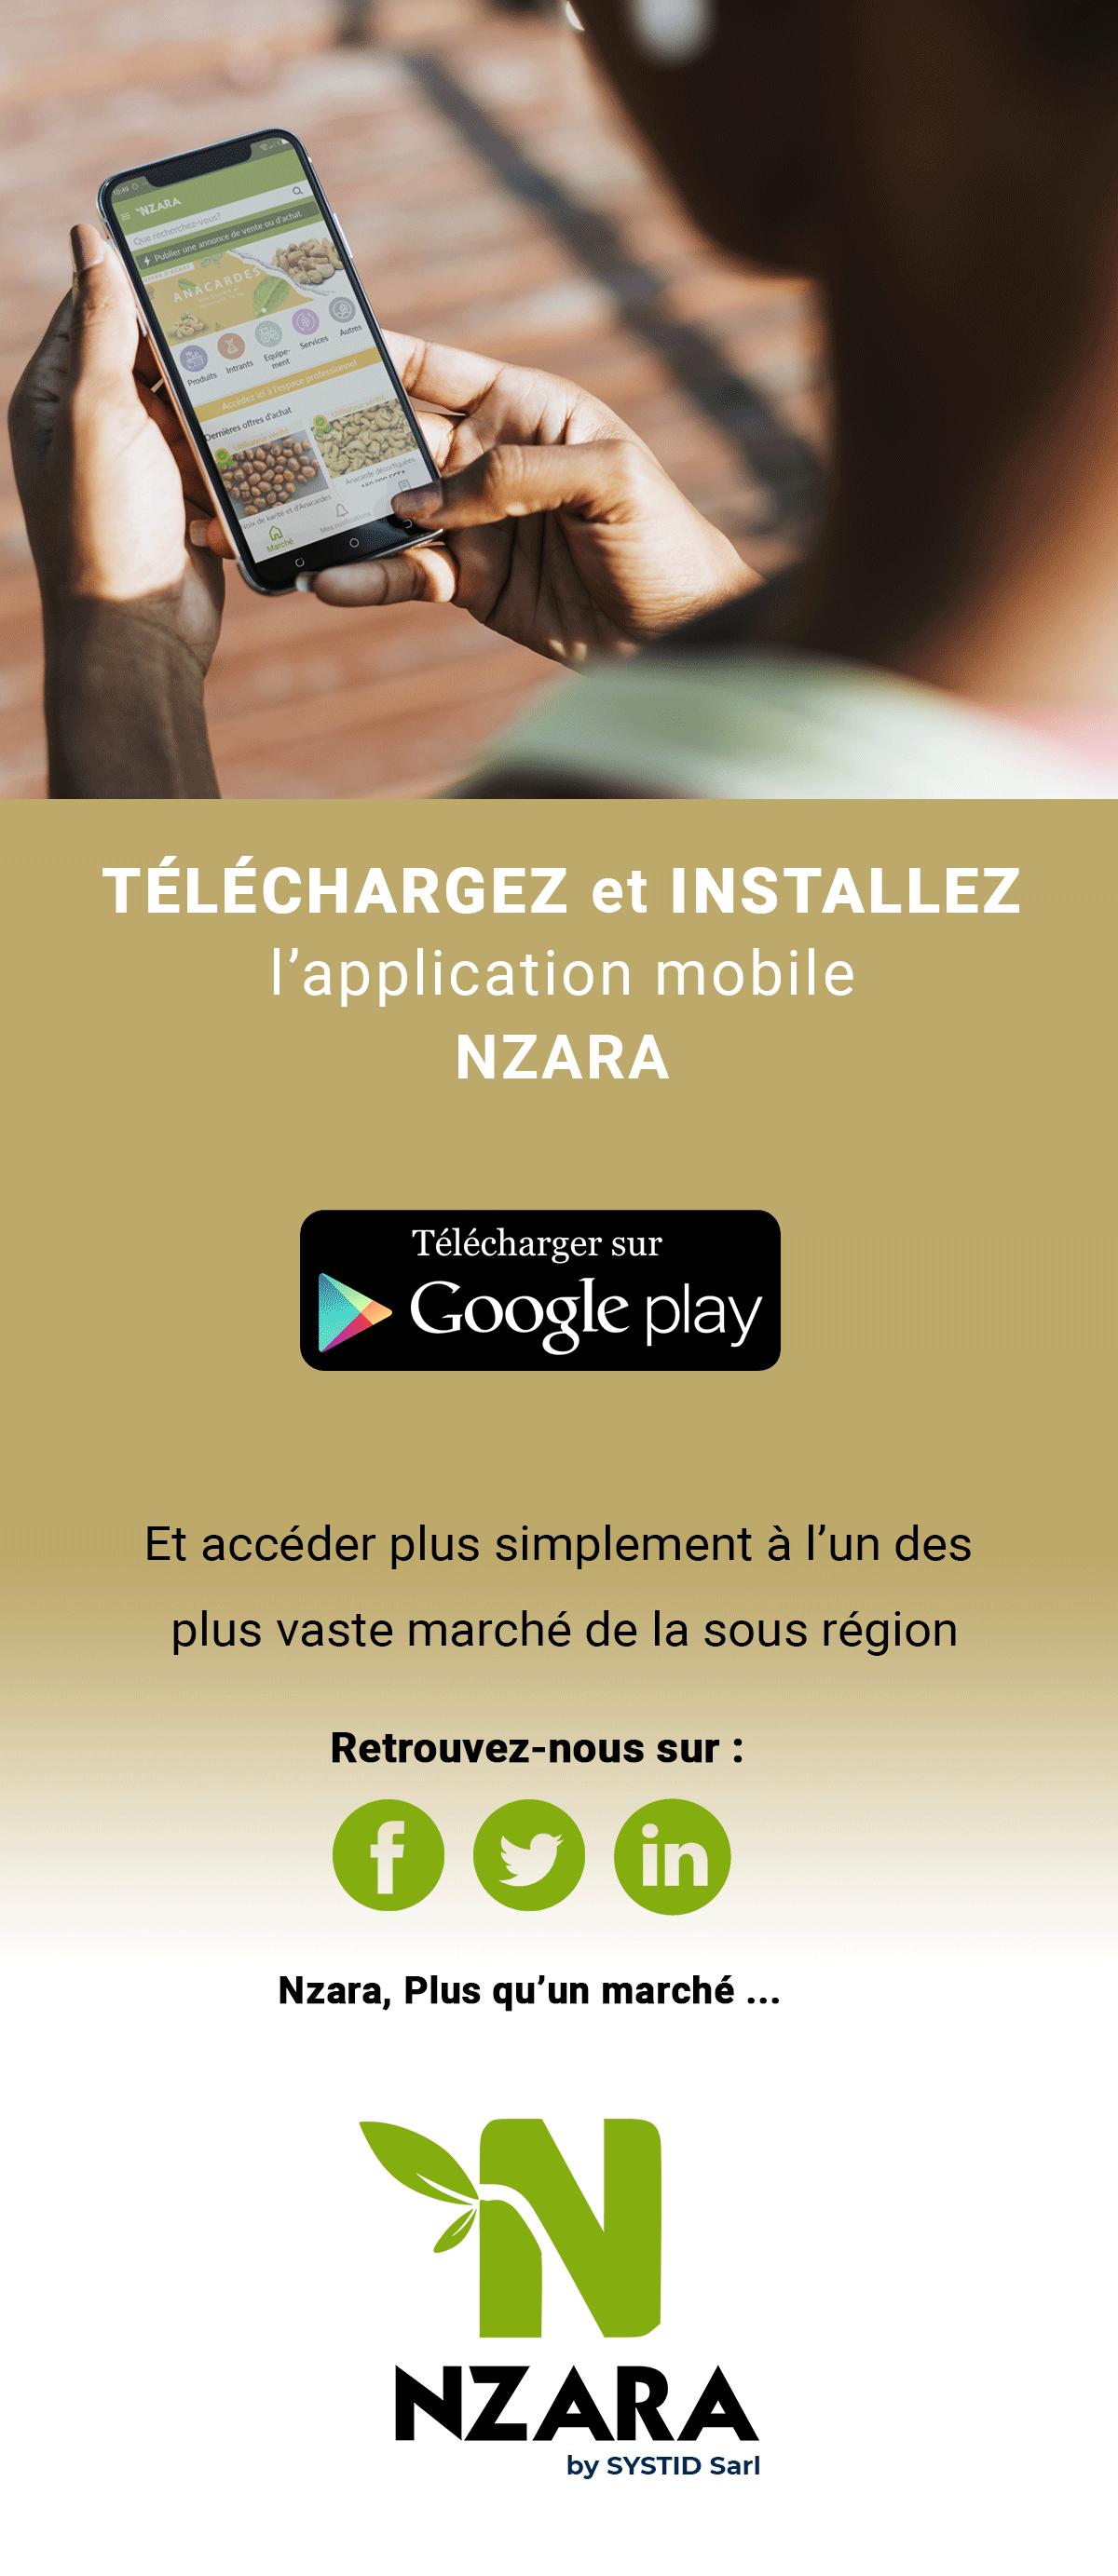 Nzara mobile app